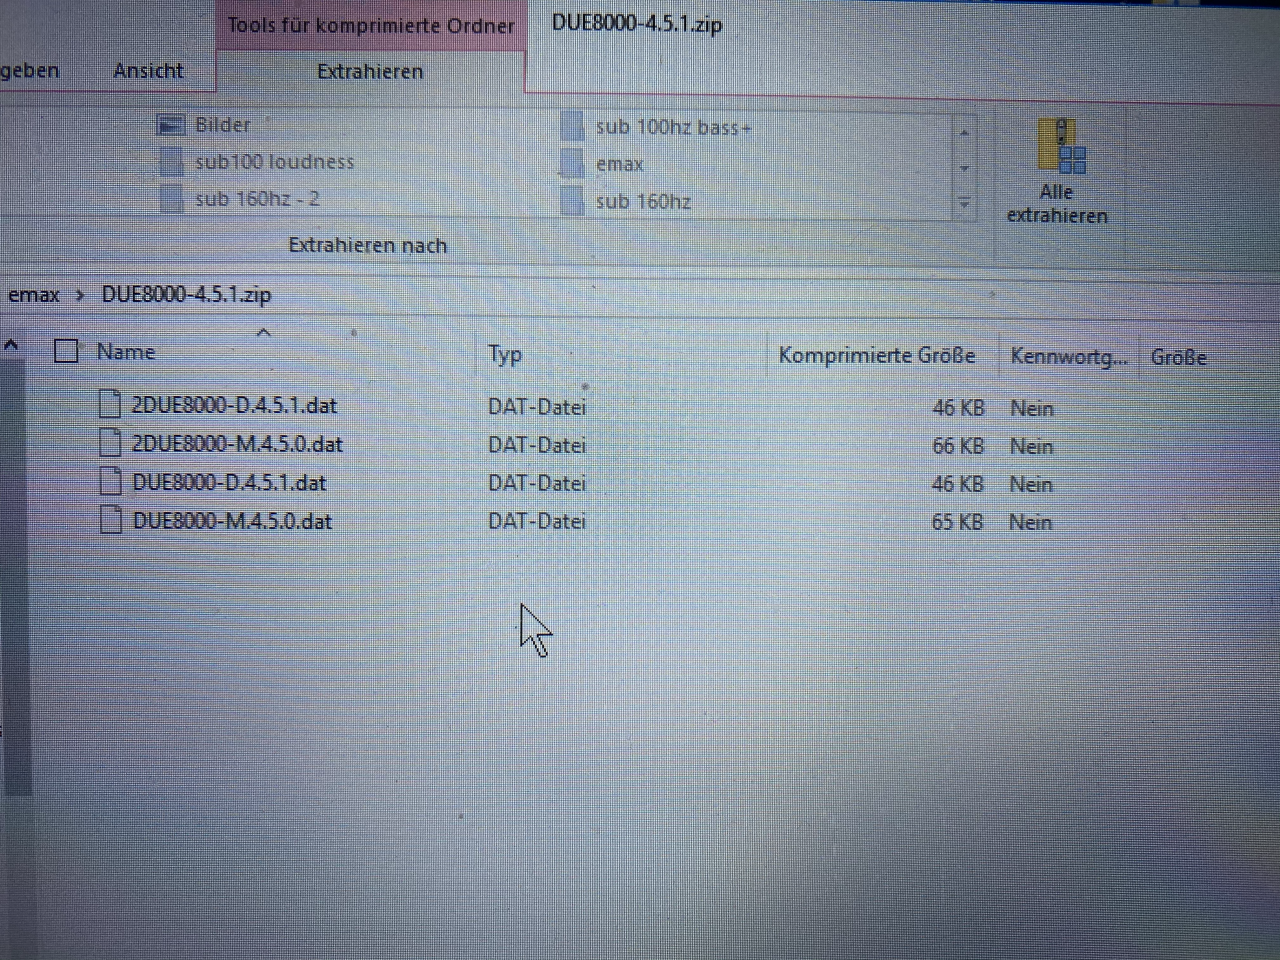 867D0681-EB5C-4AD9-9471-14D55243B2FD.png